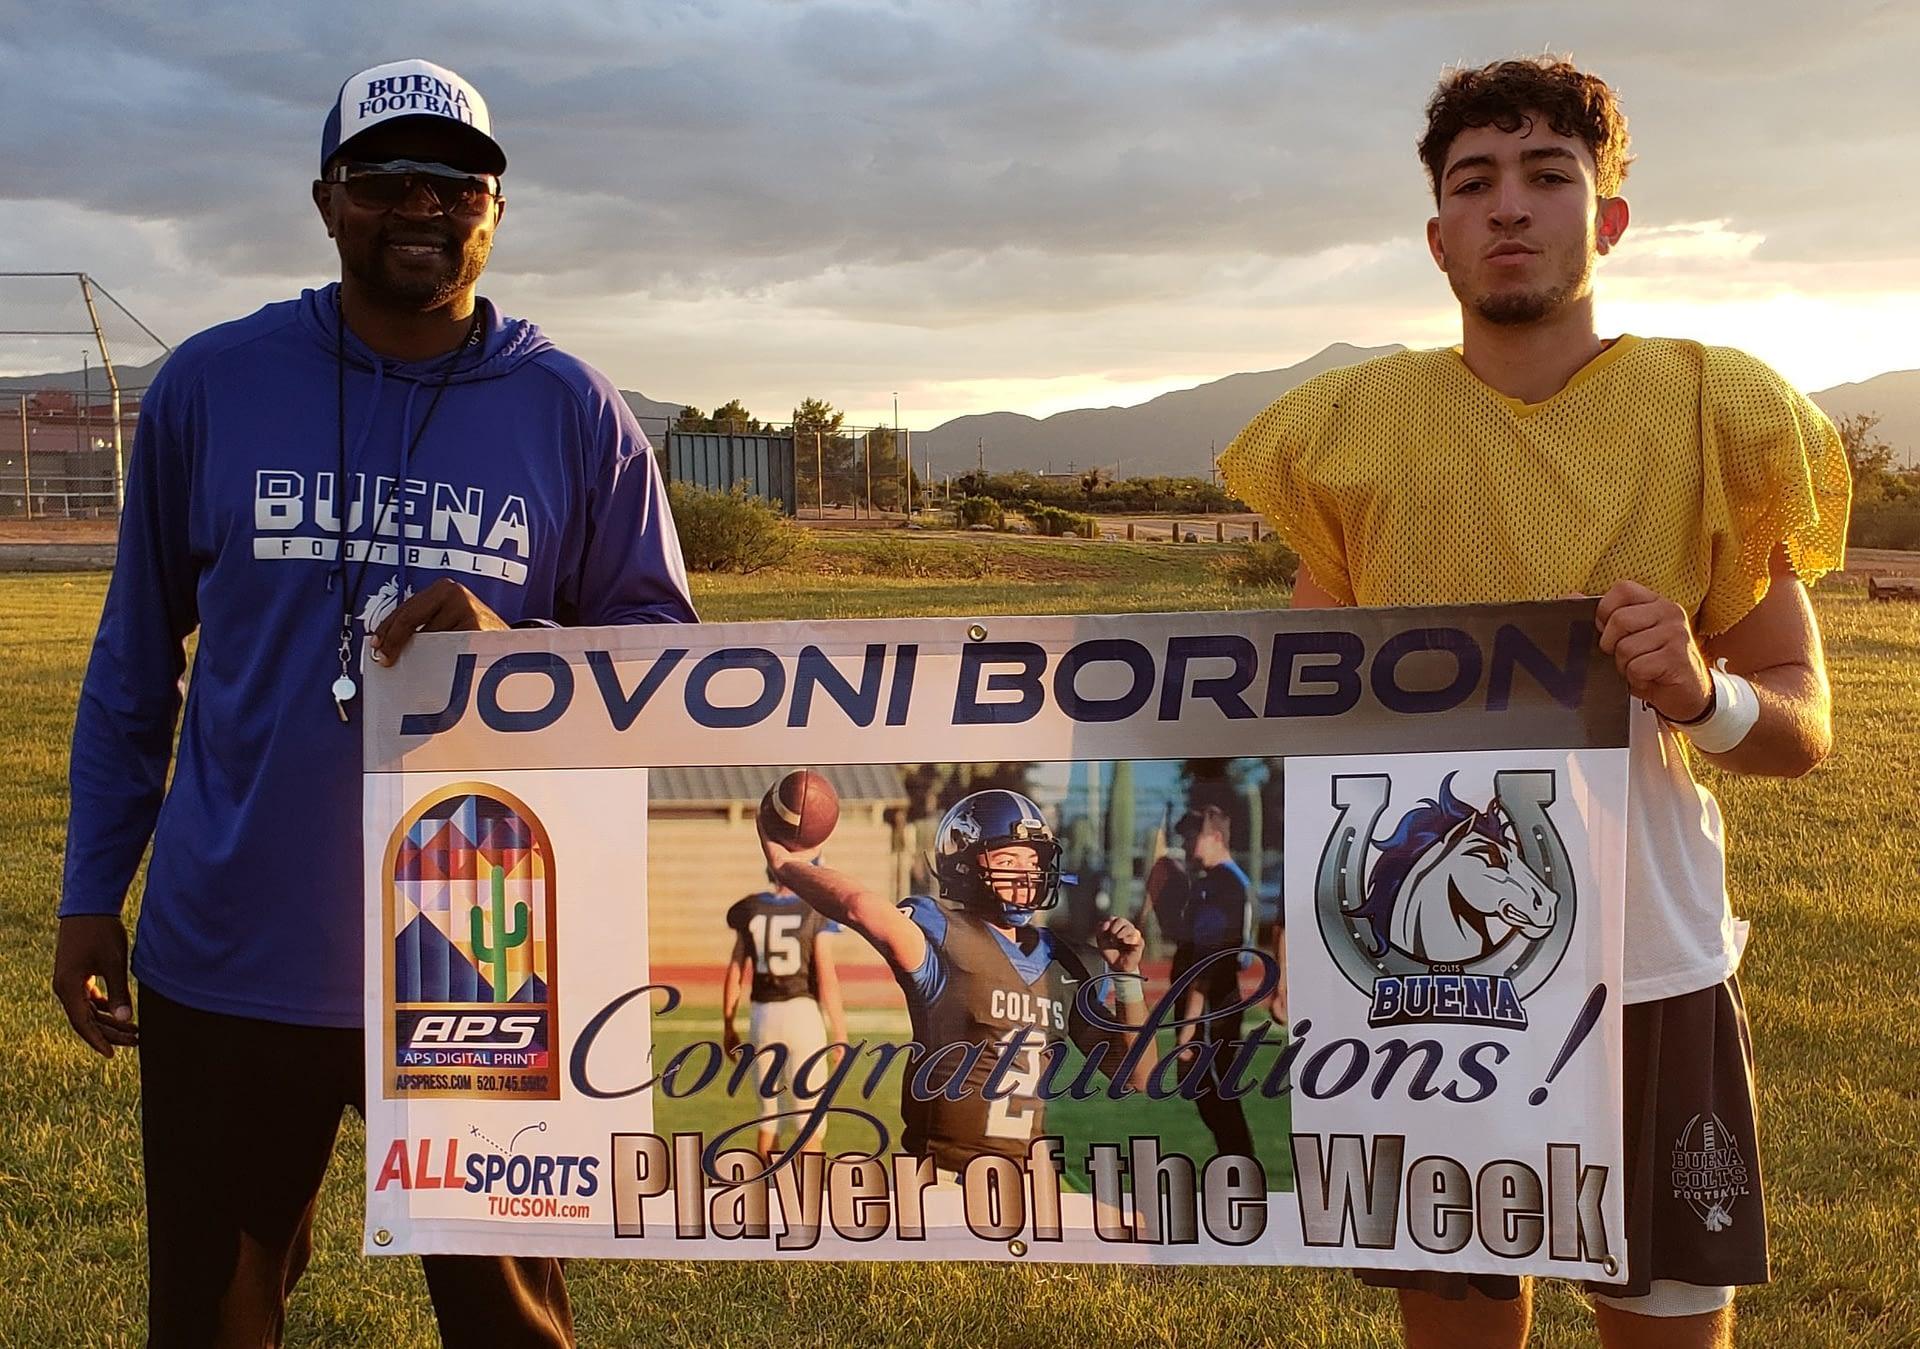 JovoniBorbon2